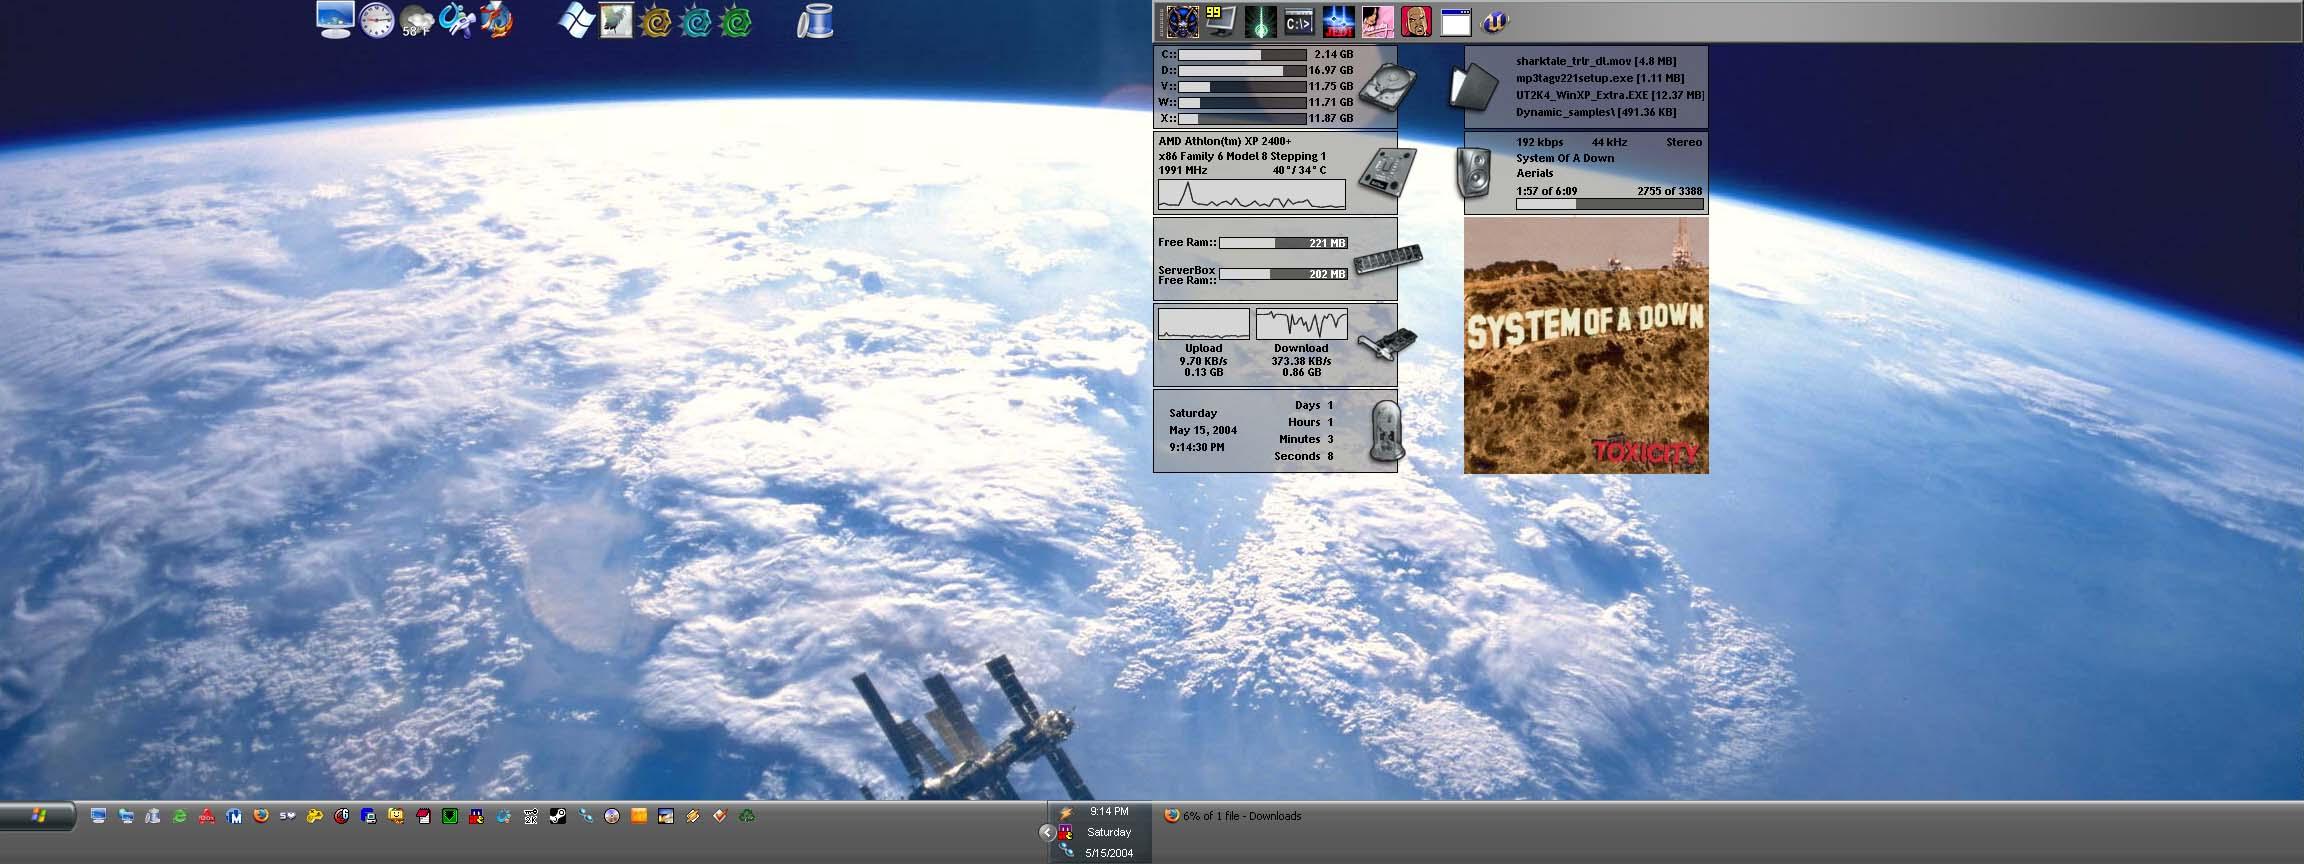 Title: [..JN.Desktop.05.15.04..]